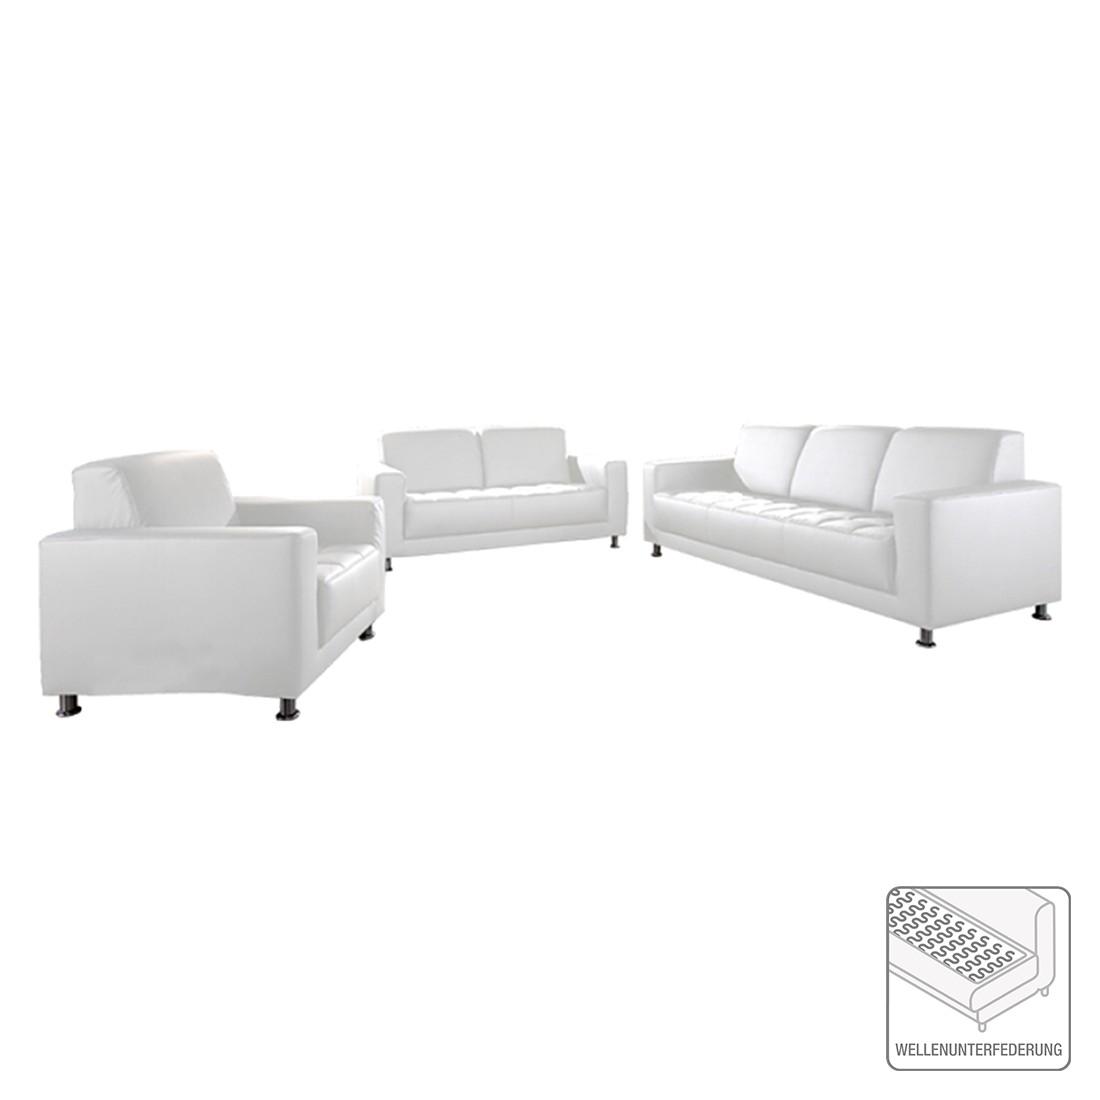 dallas polstergarnitur preisvergleich. Black Bedroom Furniture Sets. Home Design Ideas